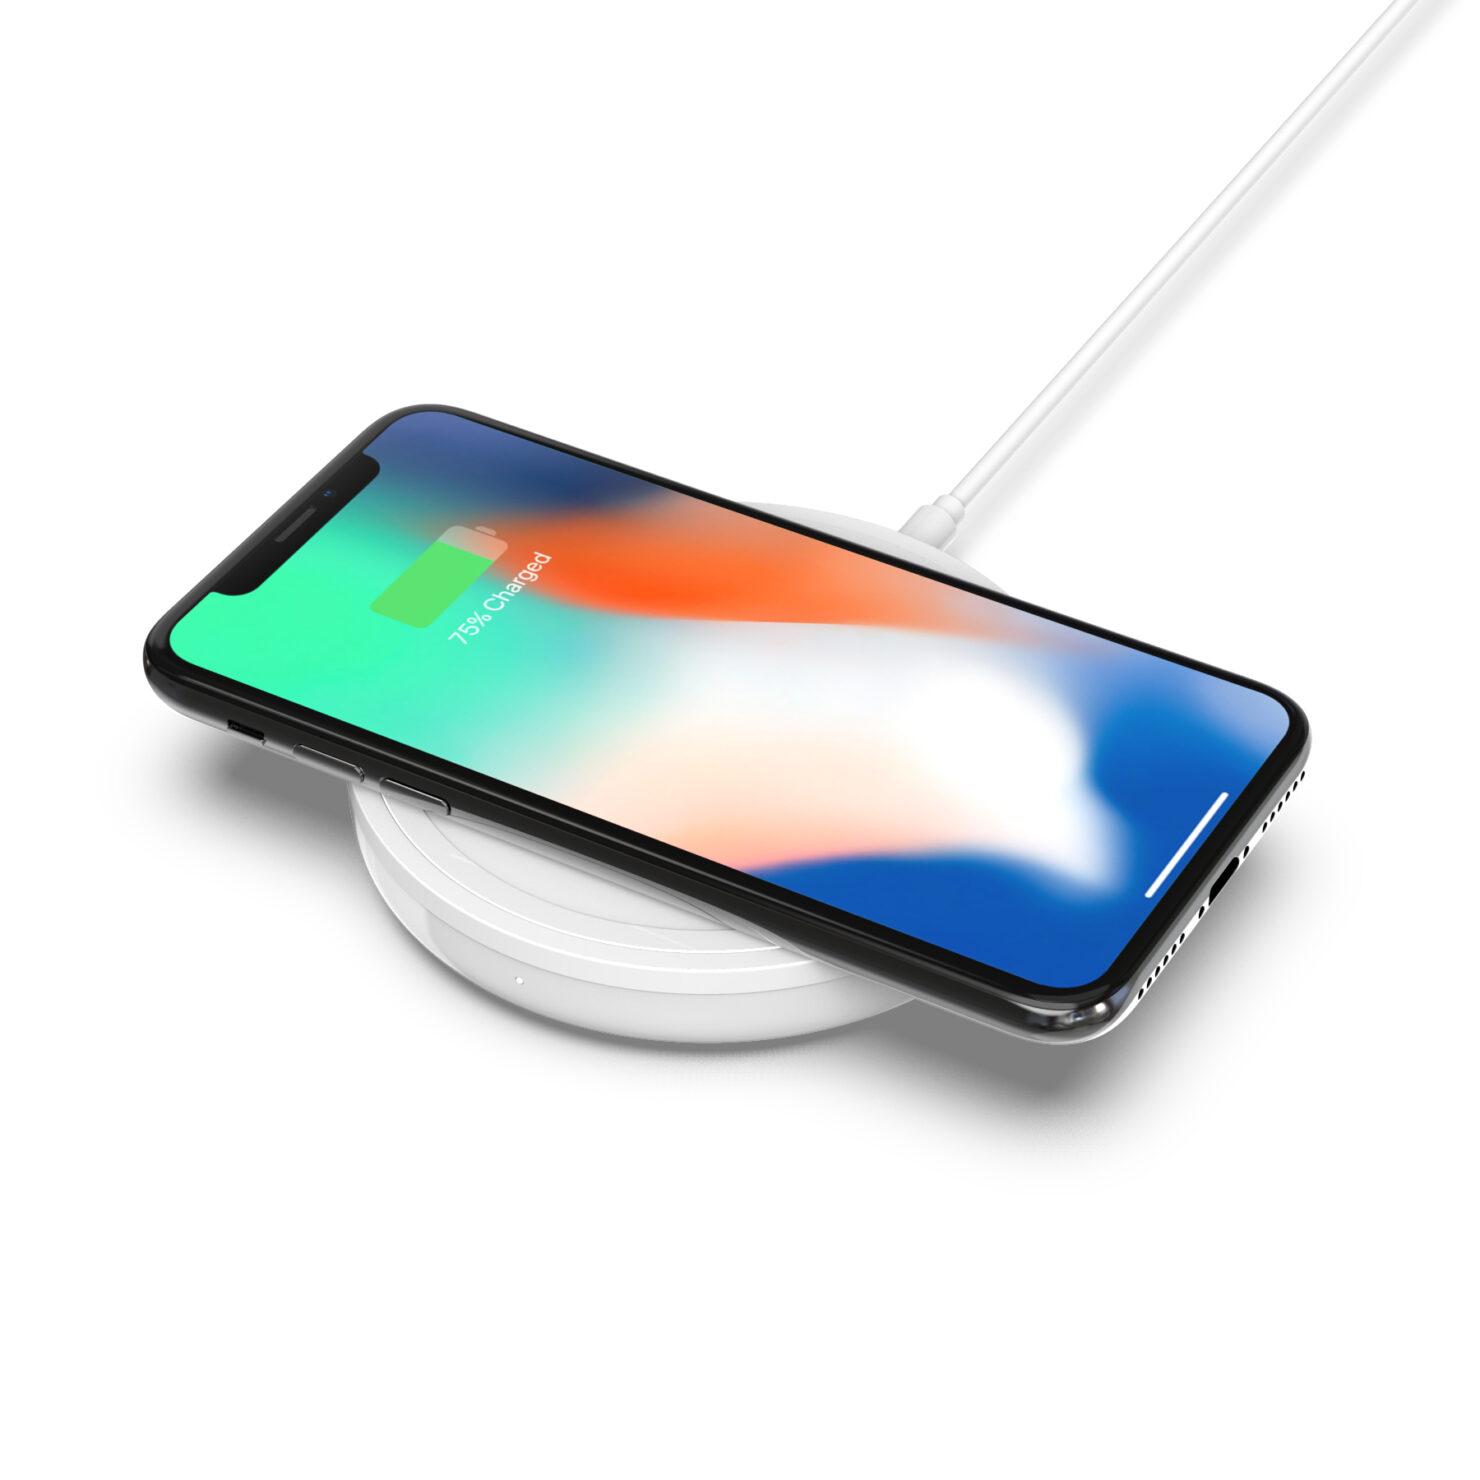 bold_charging_pad_iphone_3